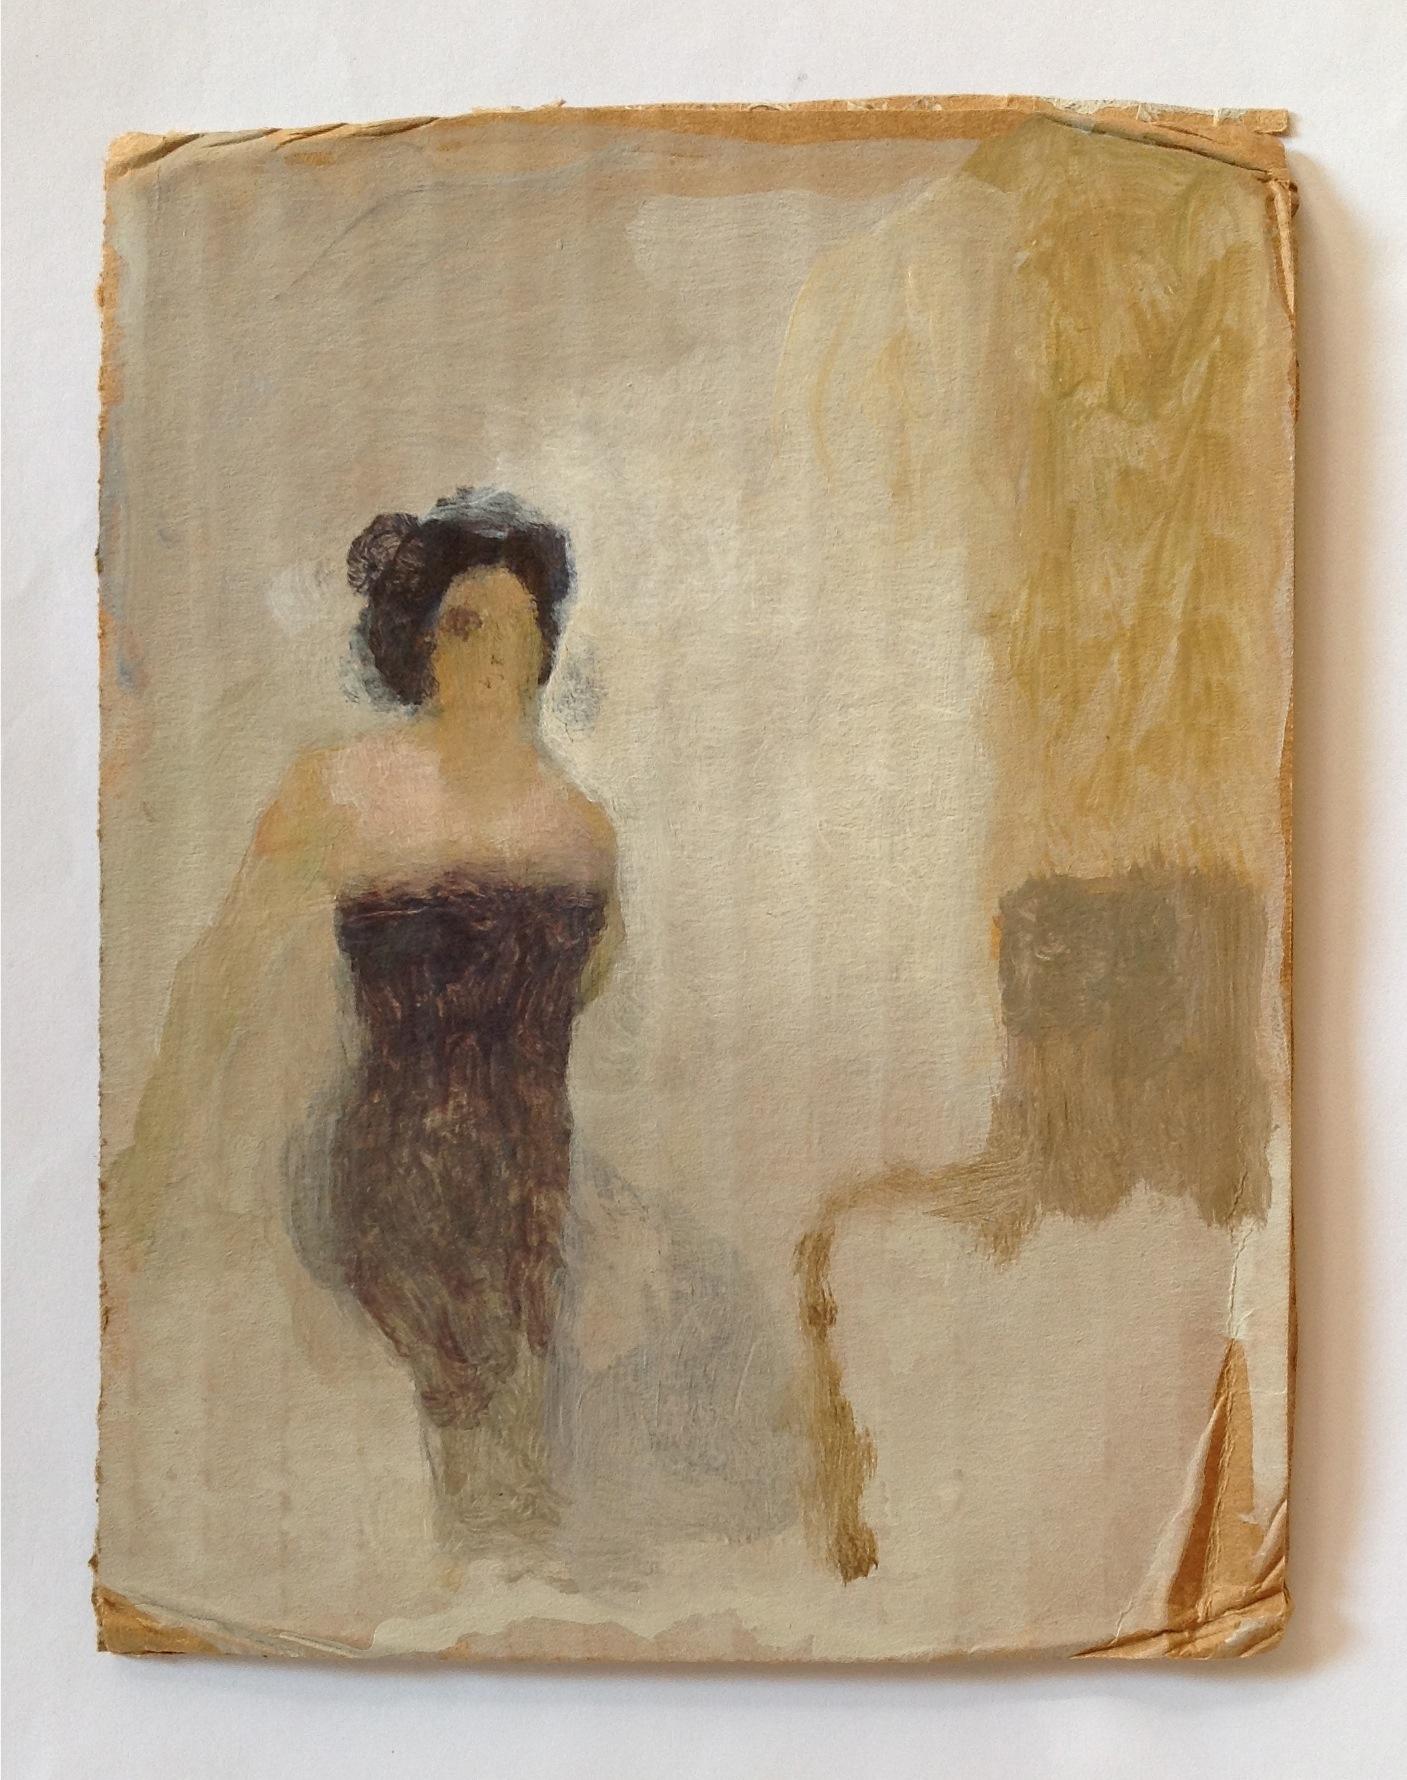 "Anthony Dubovsky  Alicia,  2006 Acrylic on cardboard 6 5/8"" x 5"" Retail Value: $2500 Opening Bid: $950"